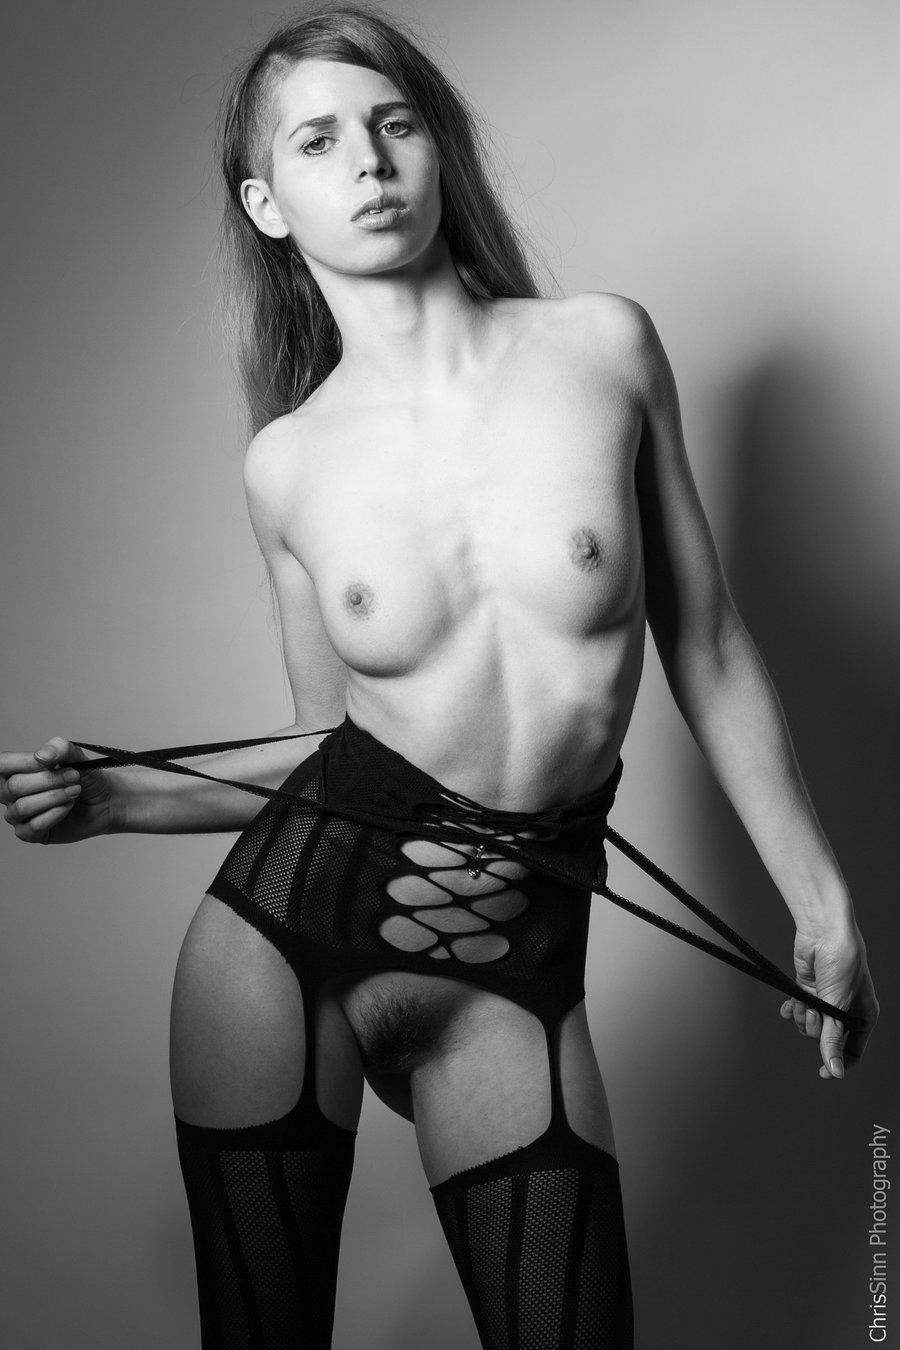 Undressed to impress